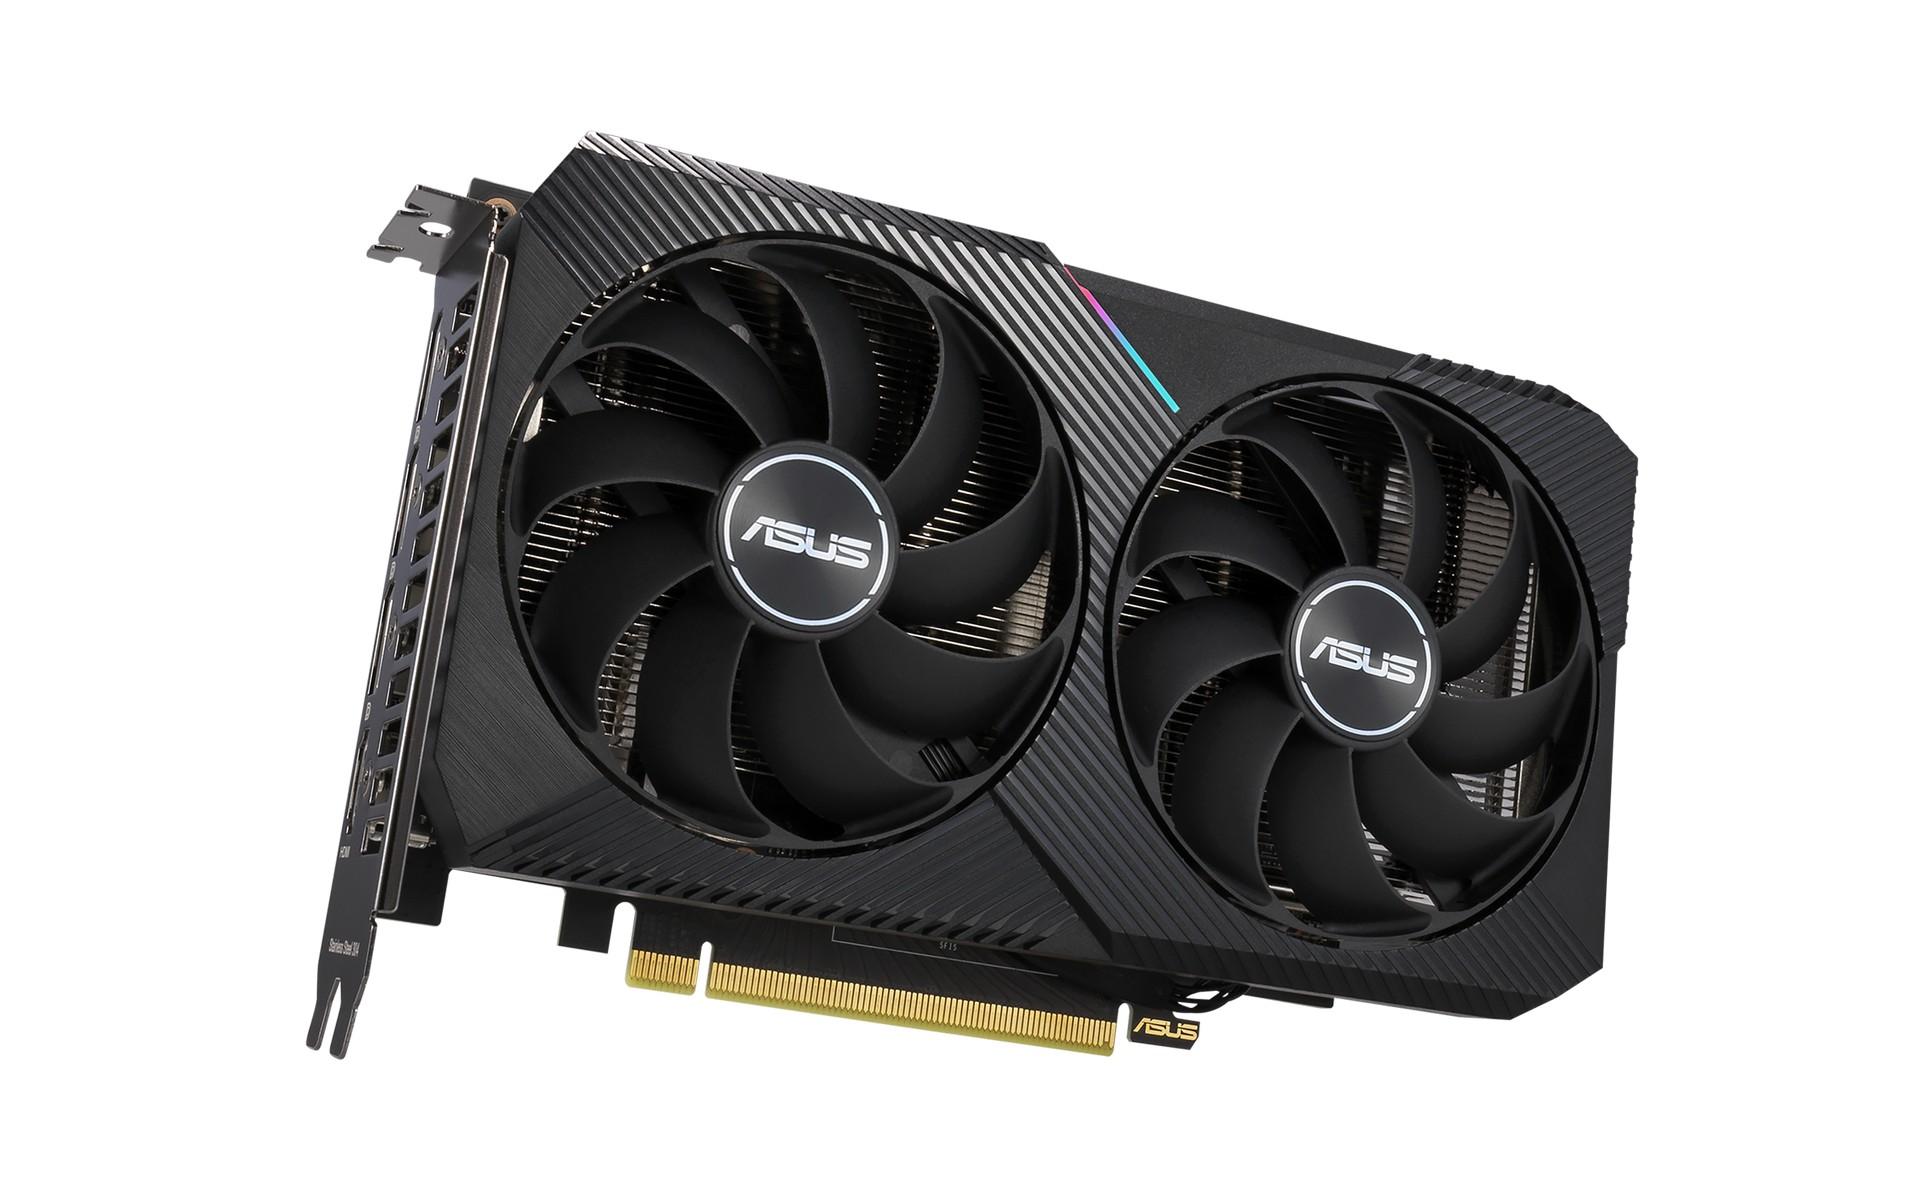 Card Màn Hình ASUS Dual GeForce RTX 3060 OC Edition 12GB GDDR6